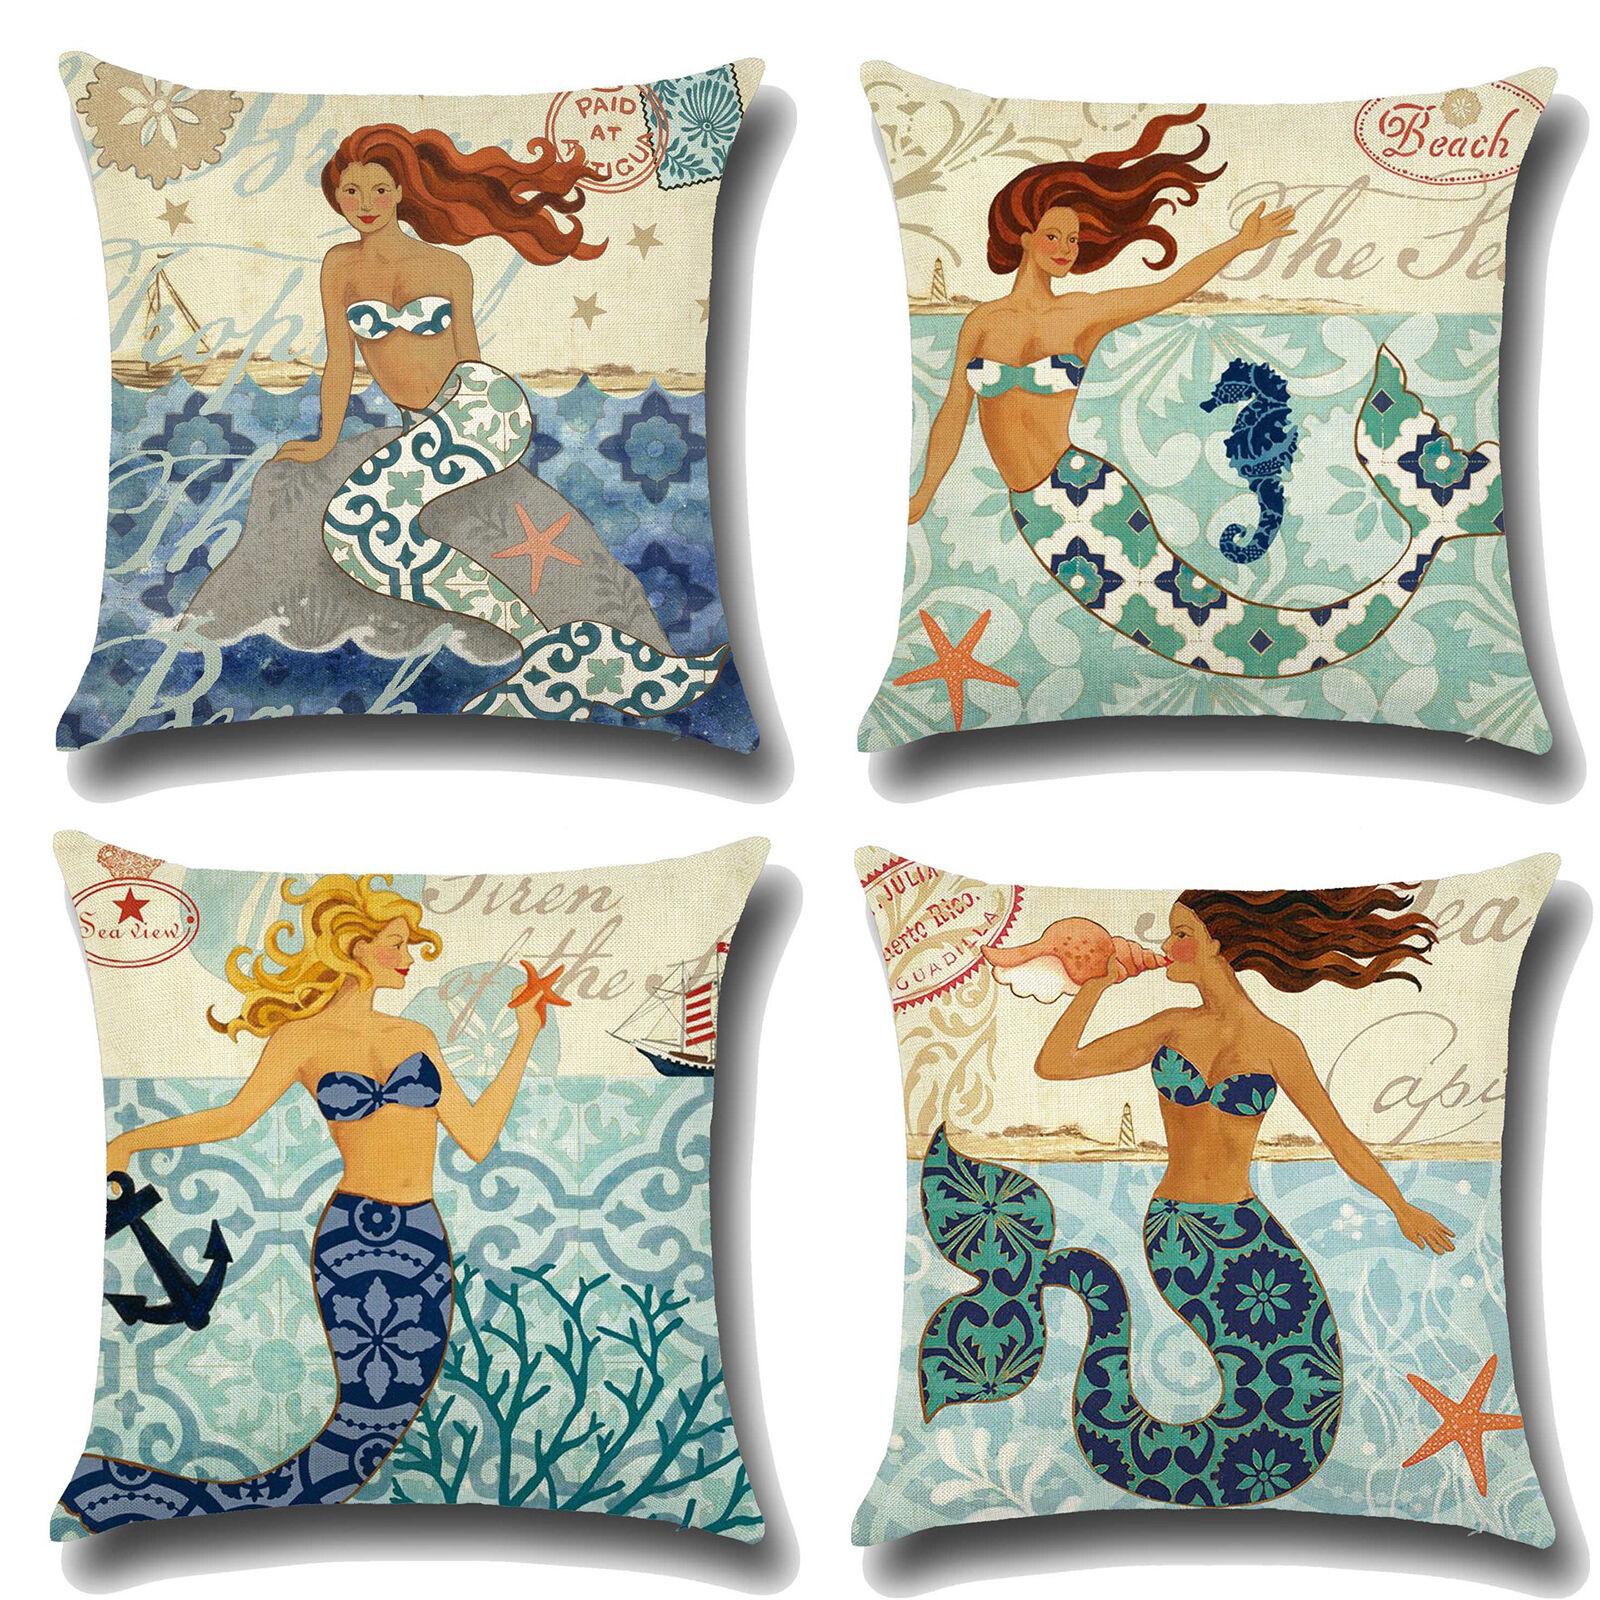 Home Decor Soft Cushion Cover Pillow Mermaid  Cotton Linen Sofa Car Pillow Case